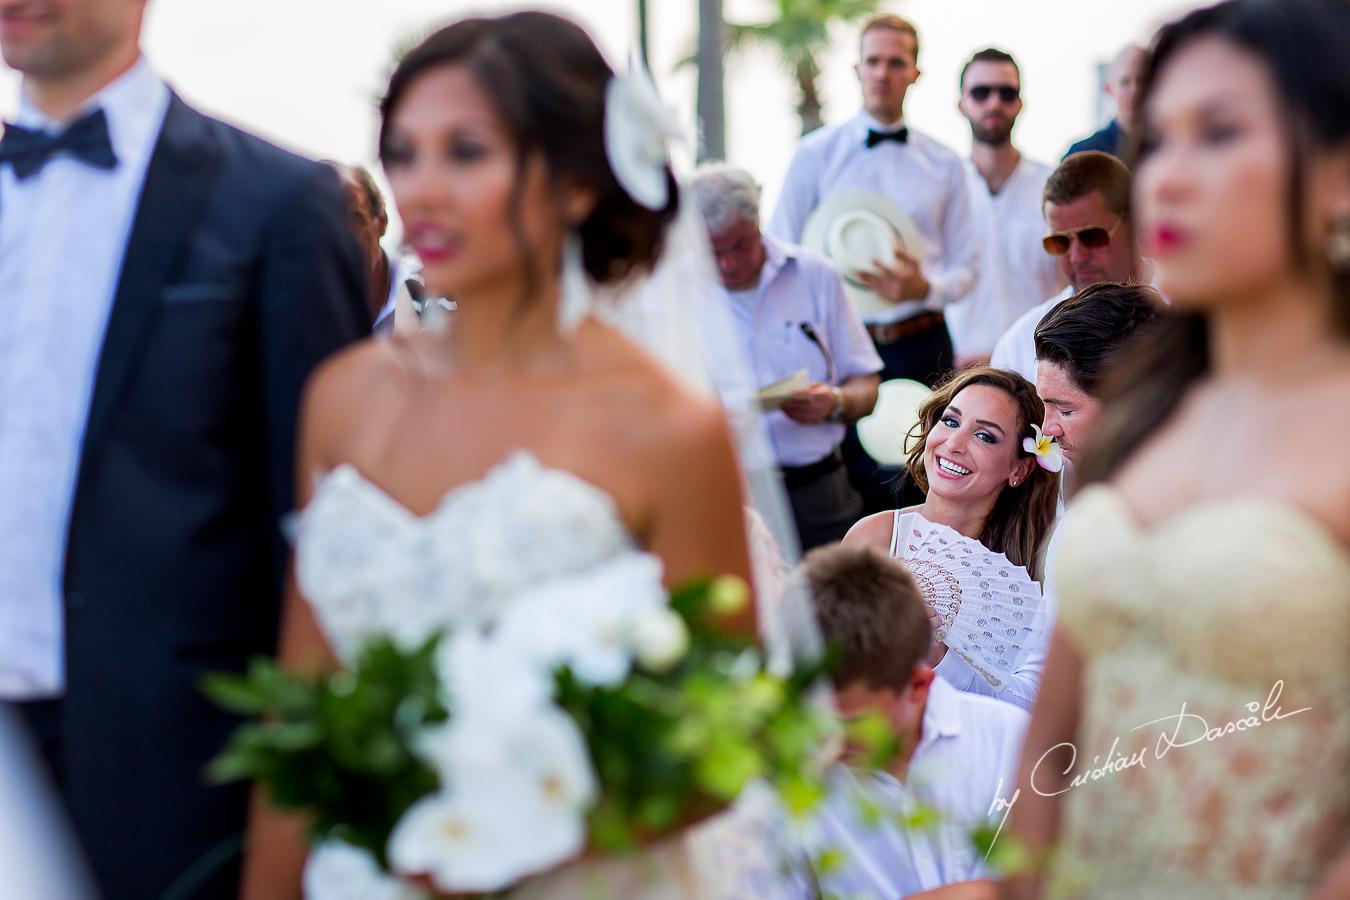 Wedding moments captured at a wedding in Ayia Napa, Cyprus by Cristian Dascalu.